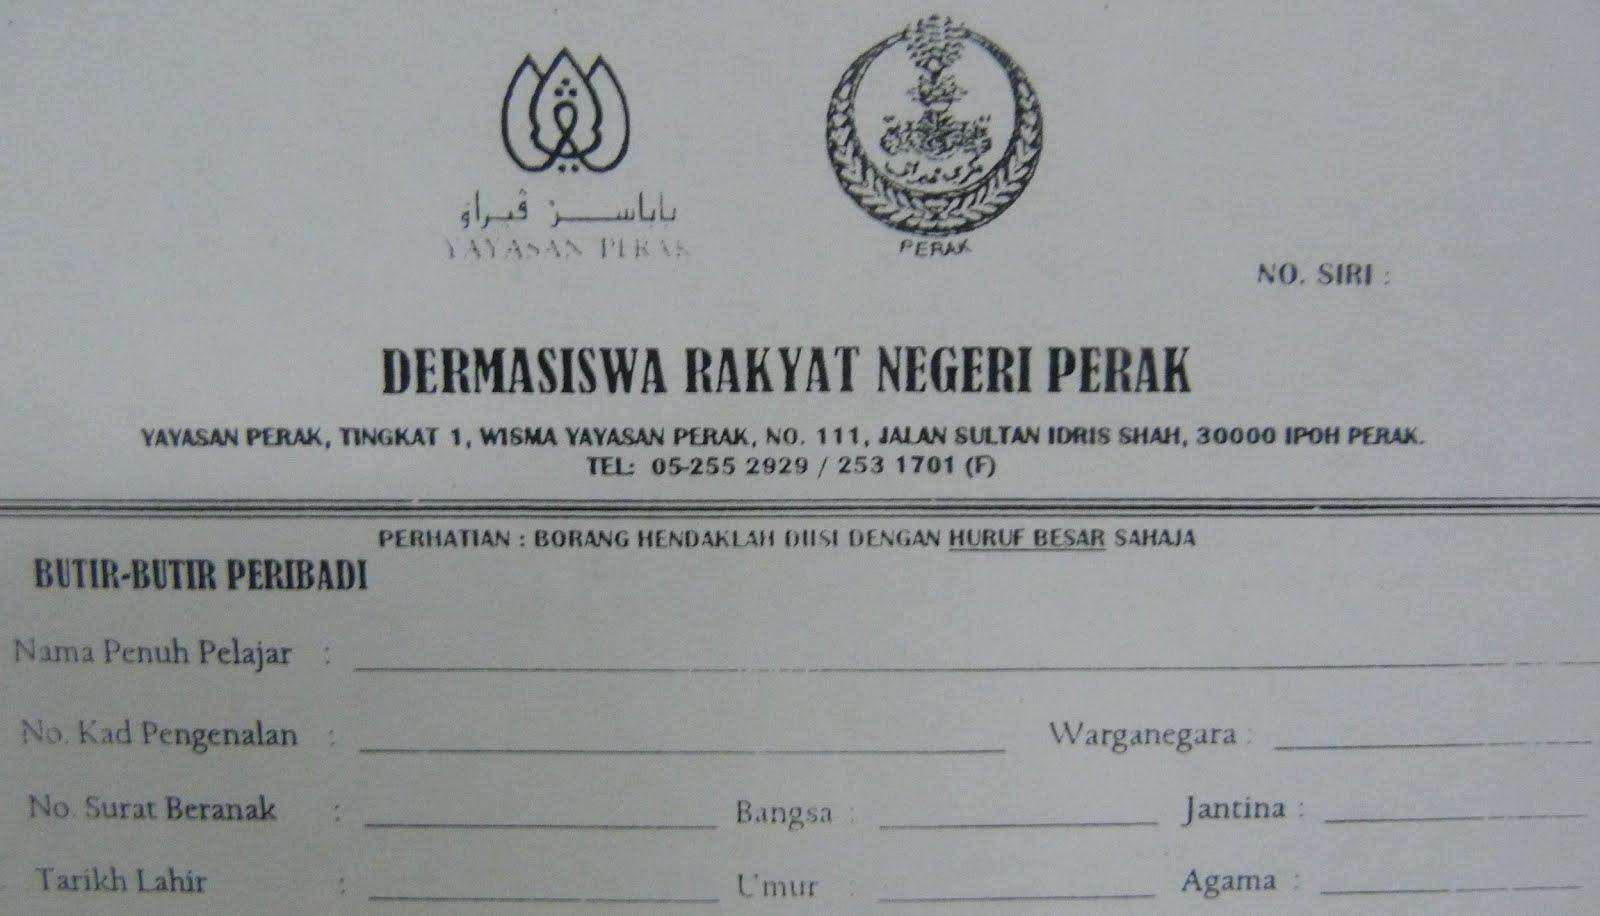 Sisi Bukit Dermasiswa Rakyat Negeri Perak Yayasan Perak Tiada Duit